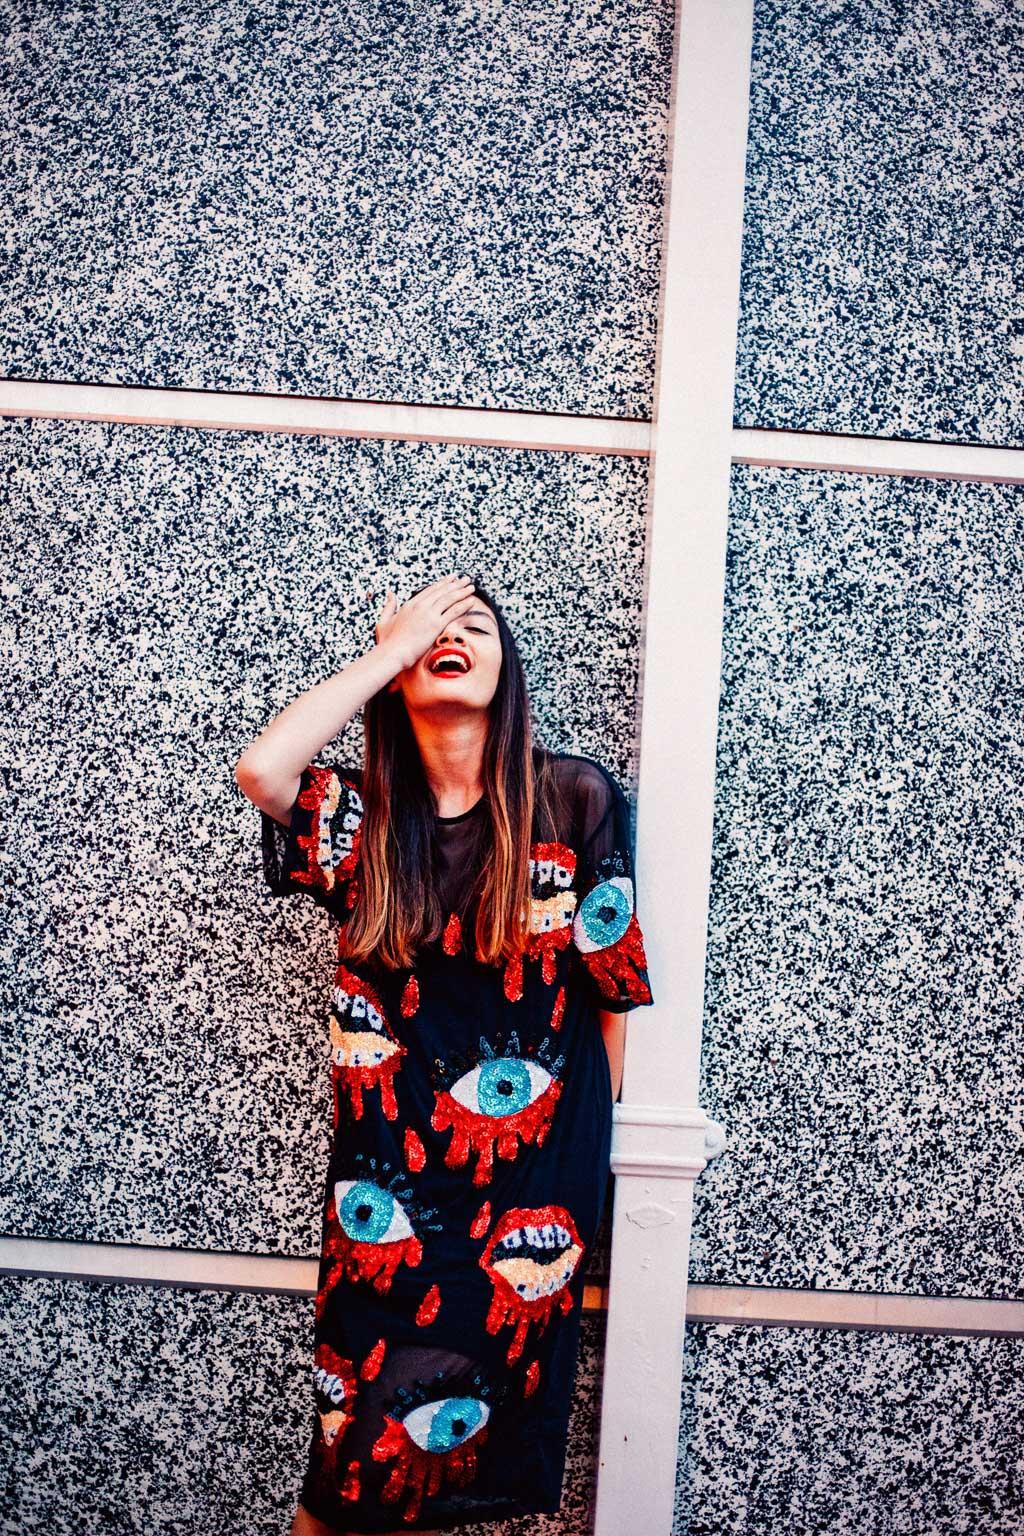 DISCOUNT REBEL - Creative Direction & Photography - Dinosaurtoast | Featuring - Natarsha Orsman @ KBM, Michael Hooker International,Red 11 & IMG International & Lemmy the Pug | Makeup - Maia Renner | Style - Jacque Shaw